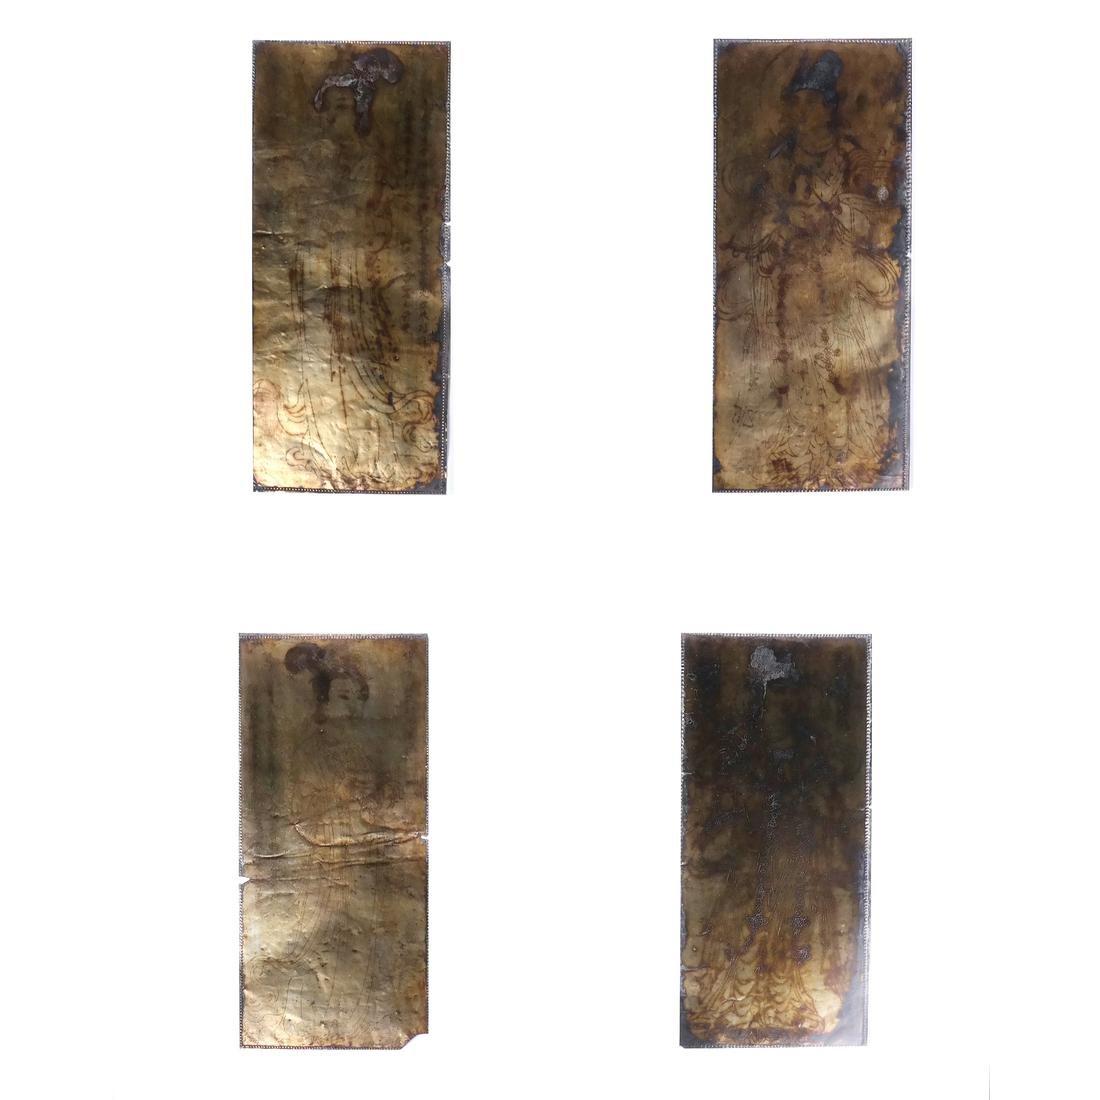 4 ASIAN GILT-SILVER RECTANGULAR MANUSCRIPT SHEETS